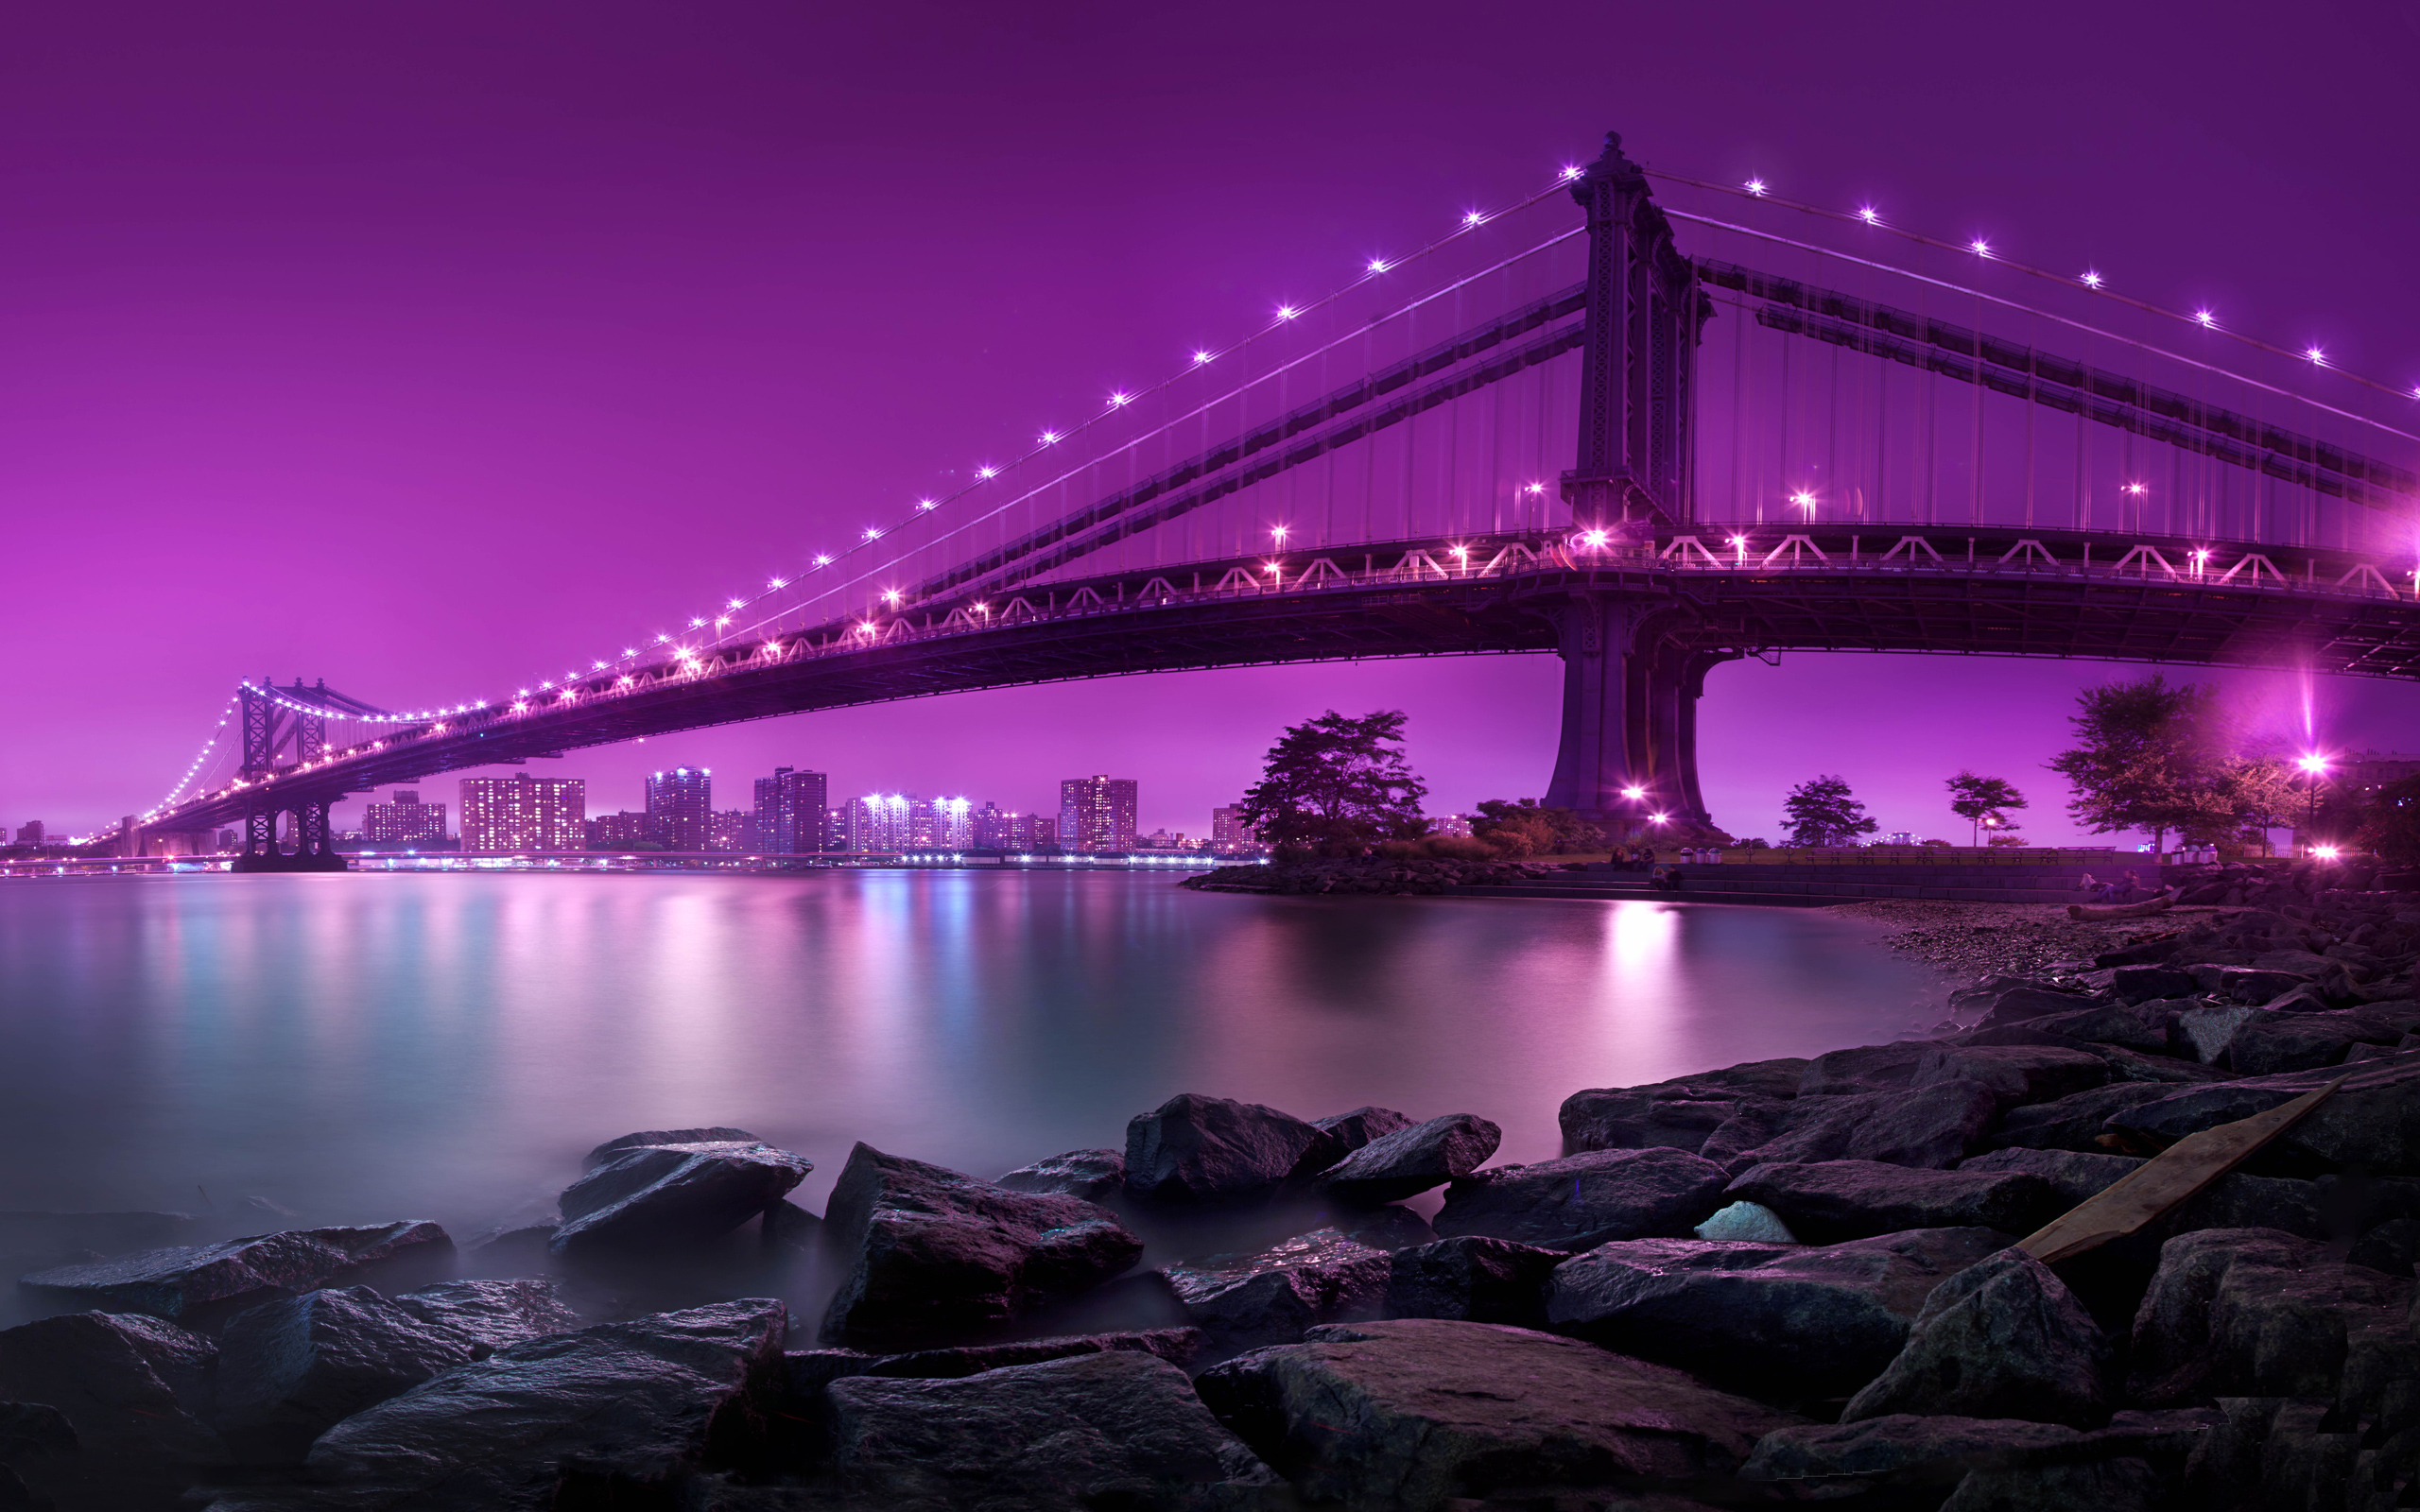 Manhattan Bridge New York City Wallpapers HD Wallpapers 2560x1600